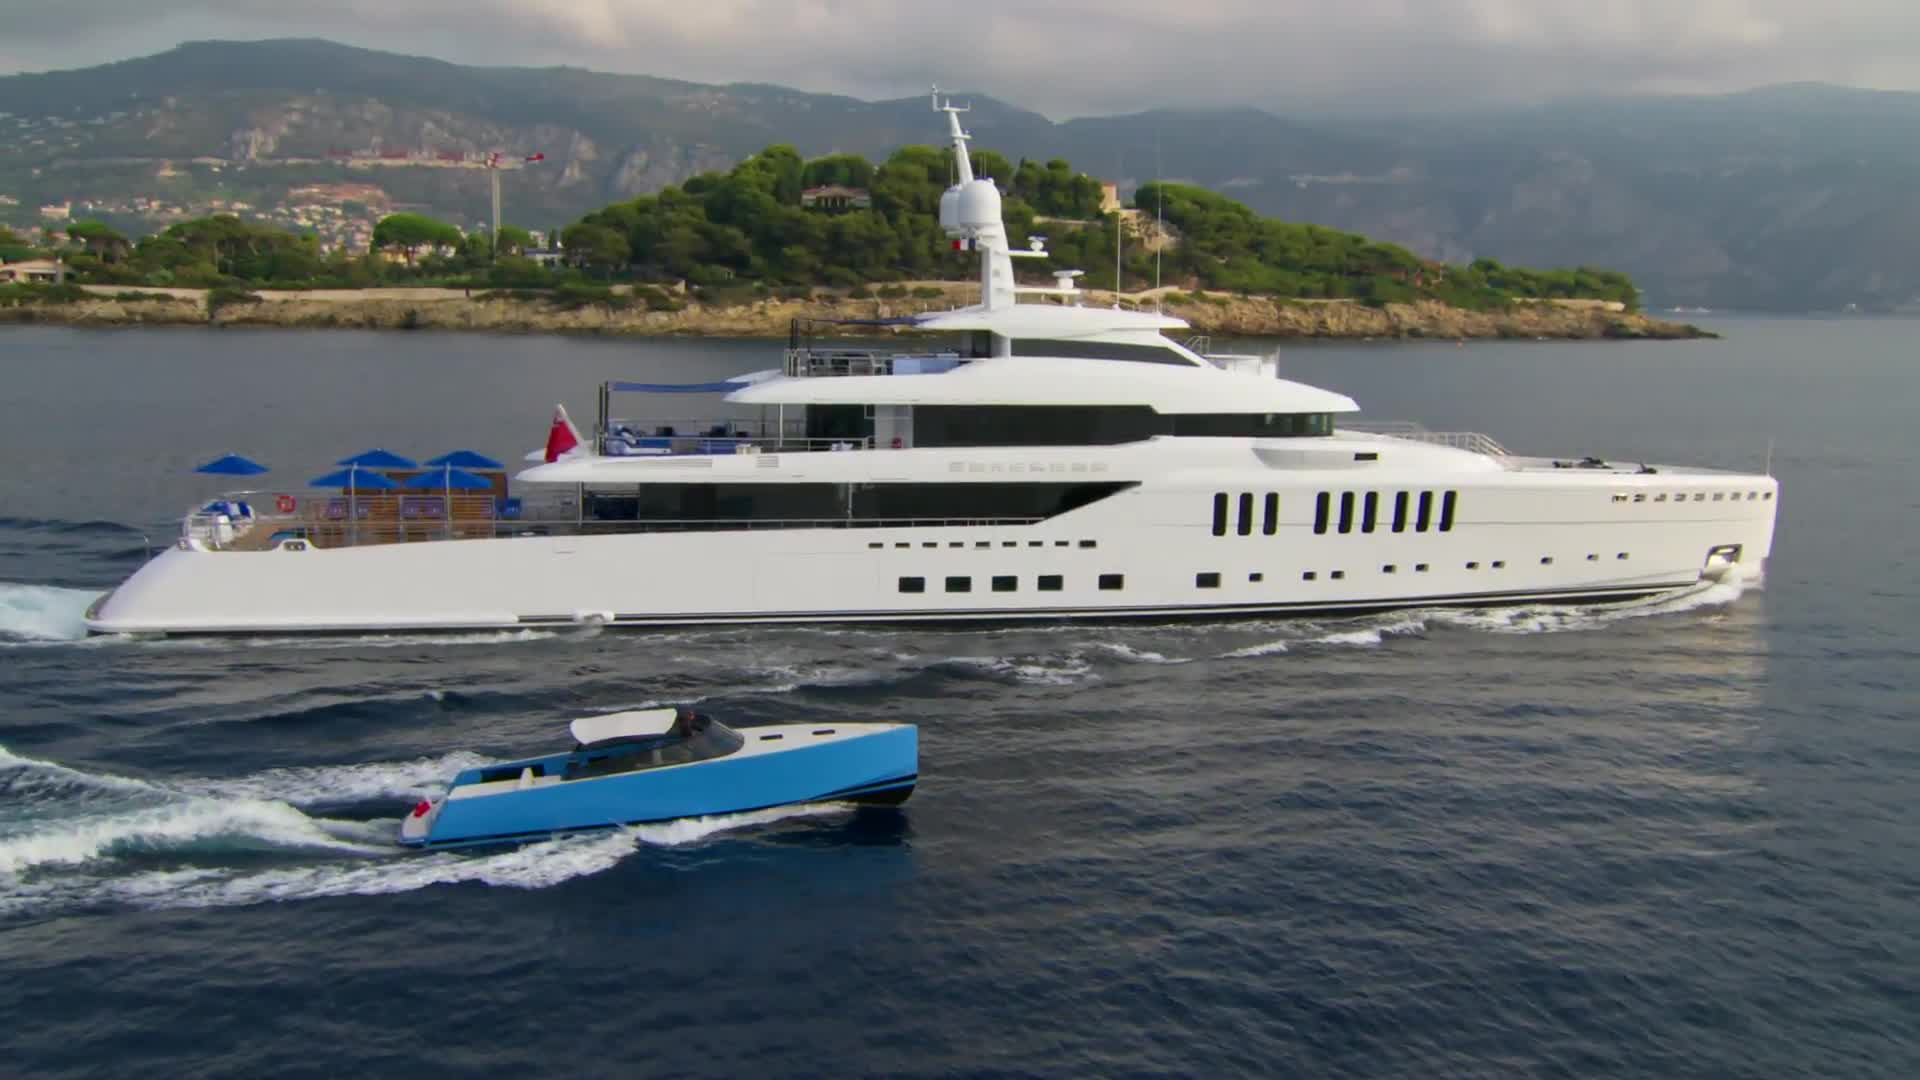 Tour the Magnificent Modern Yacht Seasense